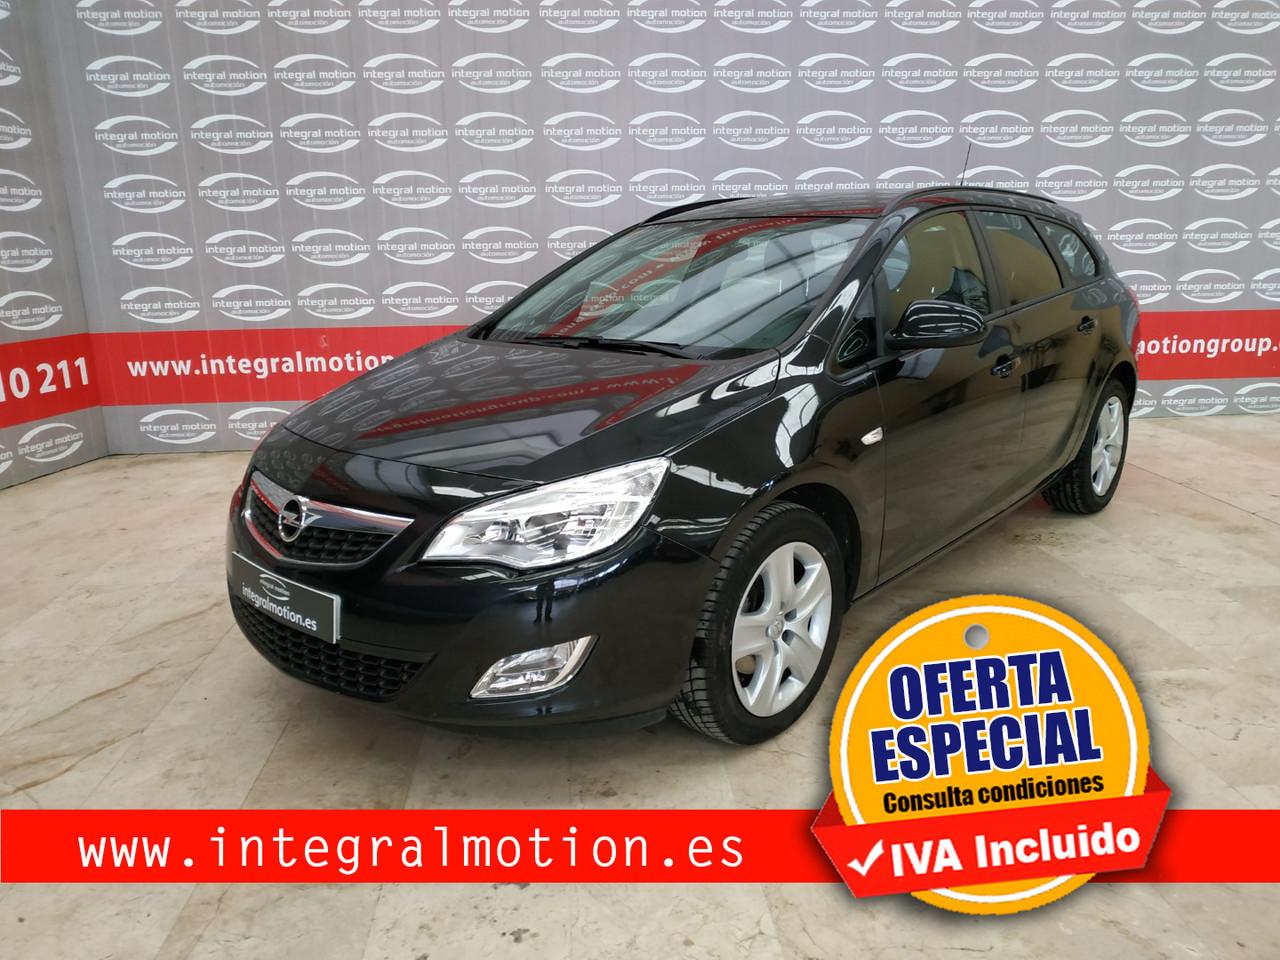 Opel Astra 1.7 CDTi 110 CV Enjoy ST  - Foto 1